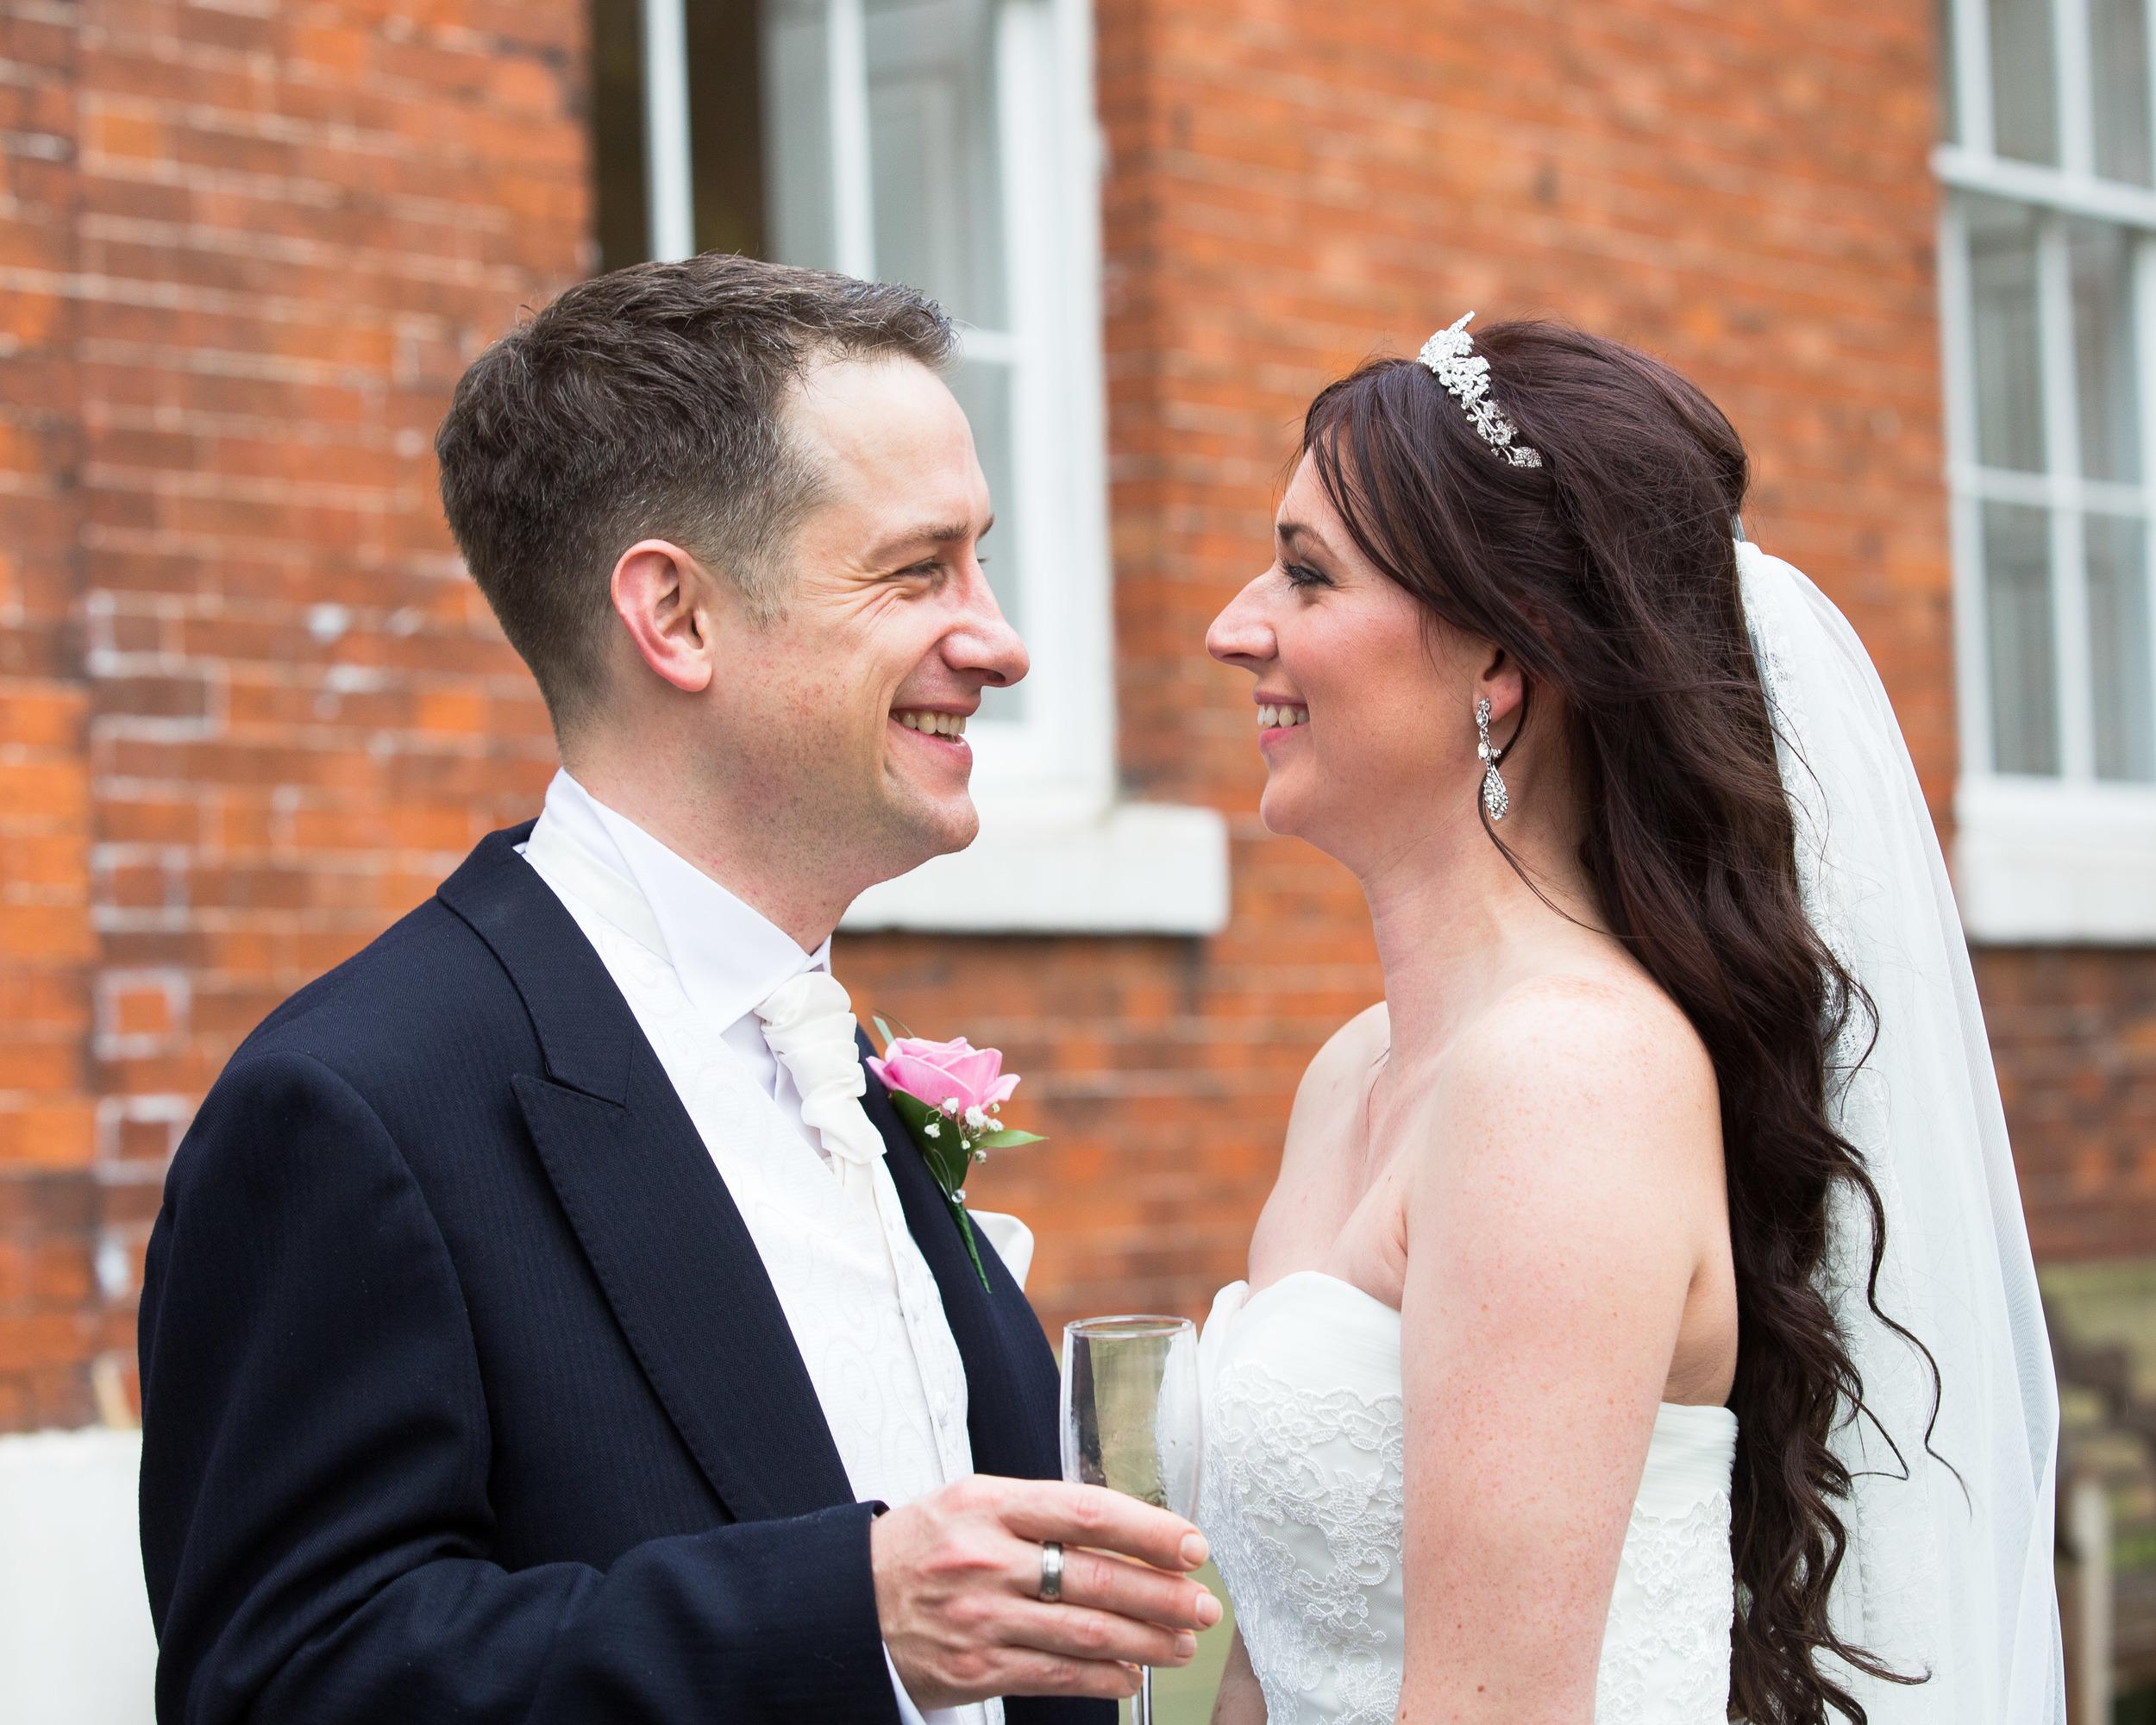 Mr-And-Mrs-Cunningham-182.jpg